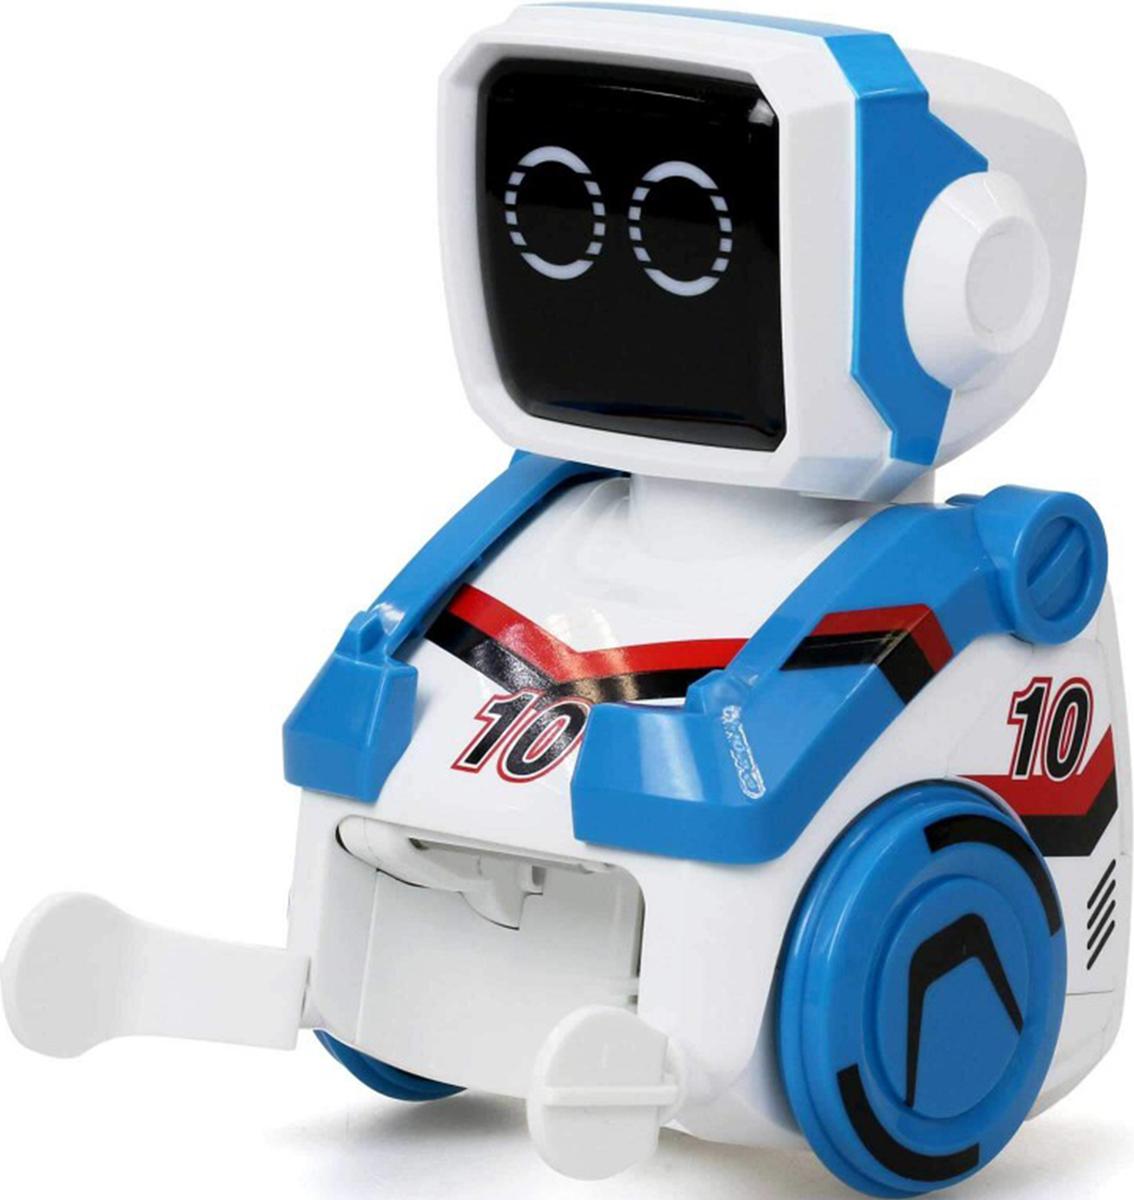 Silverlit Old School Робот футболист Кикабот цвет синий clippasafe clippasafe ворота безопасности металлические